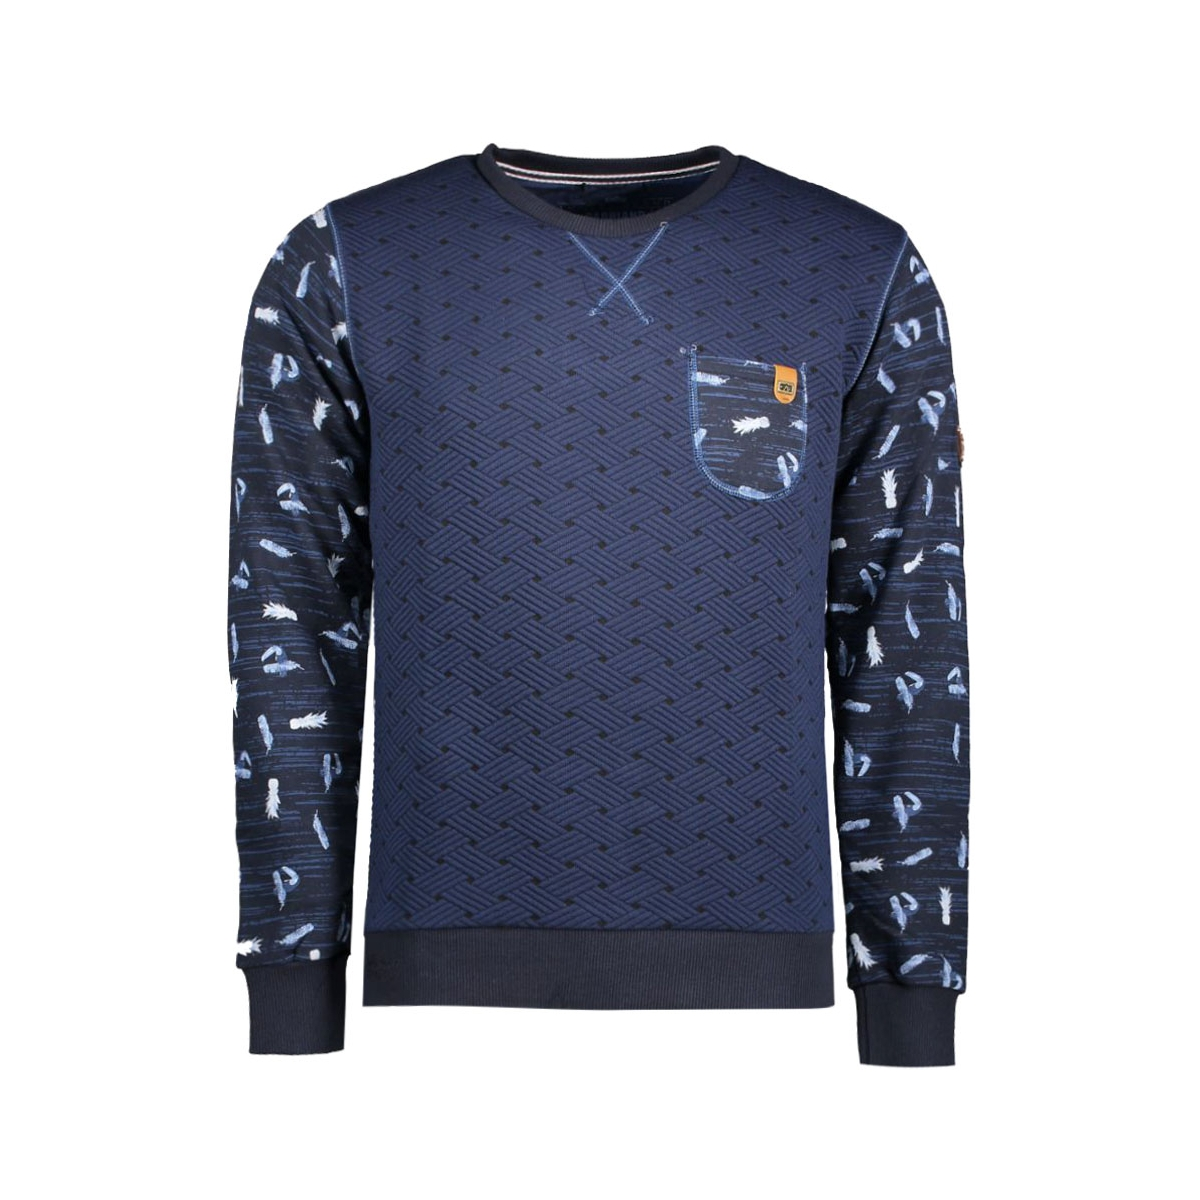 4006 gabbiano sweater navy